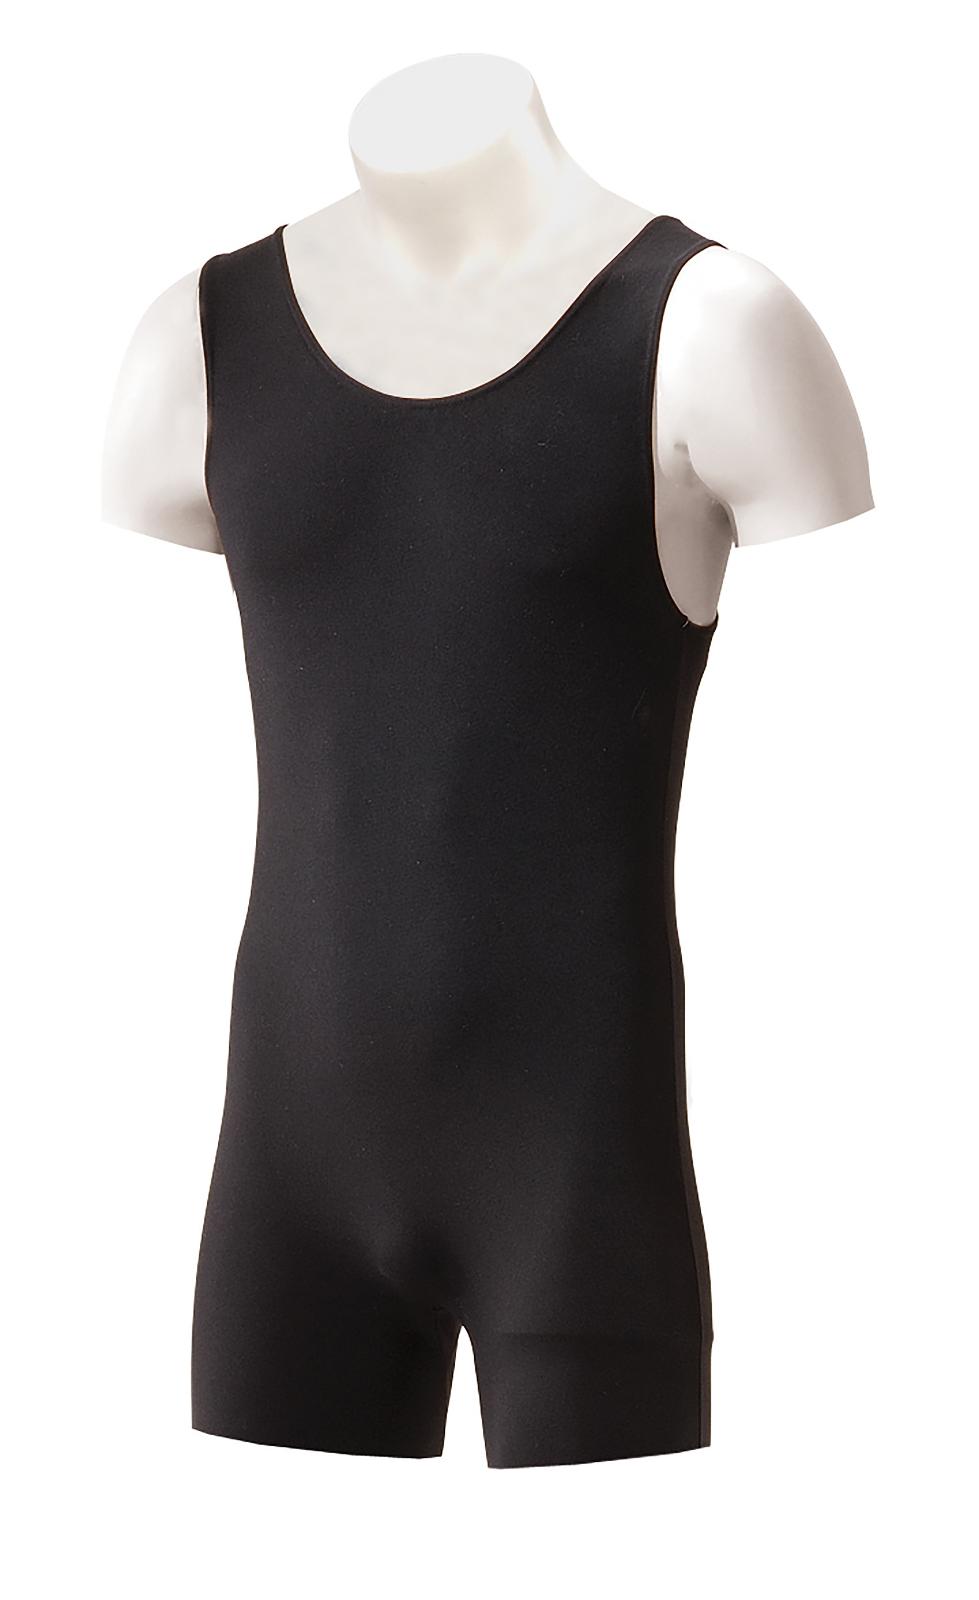 INTERMEZZO Men's and Boy's Dance Tank Style Short Unitard Cotton/Elastane Black